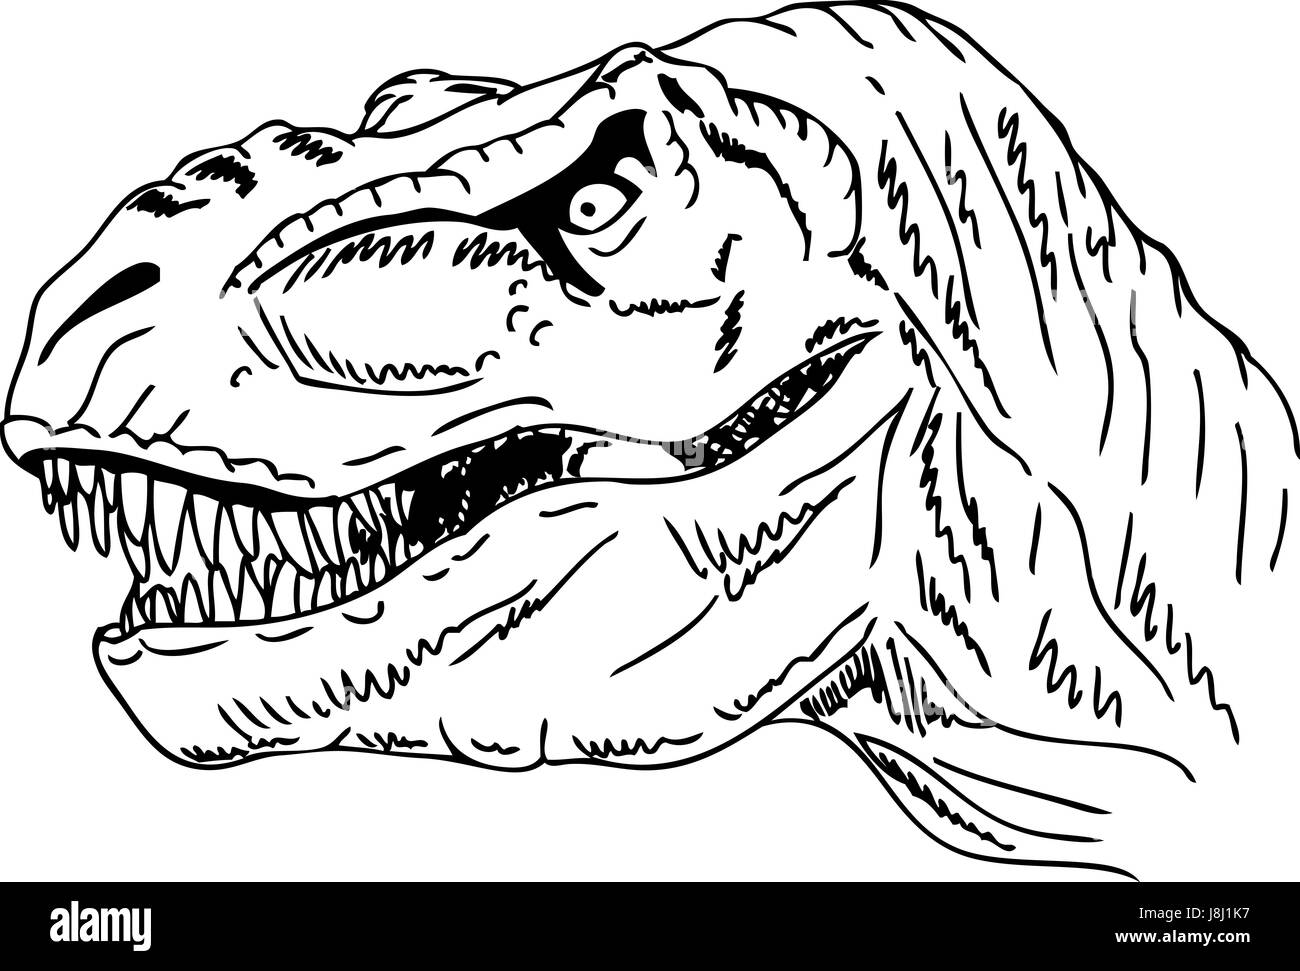 isoliert farbe reptil illustration farbe dinosaurier